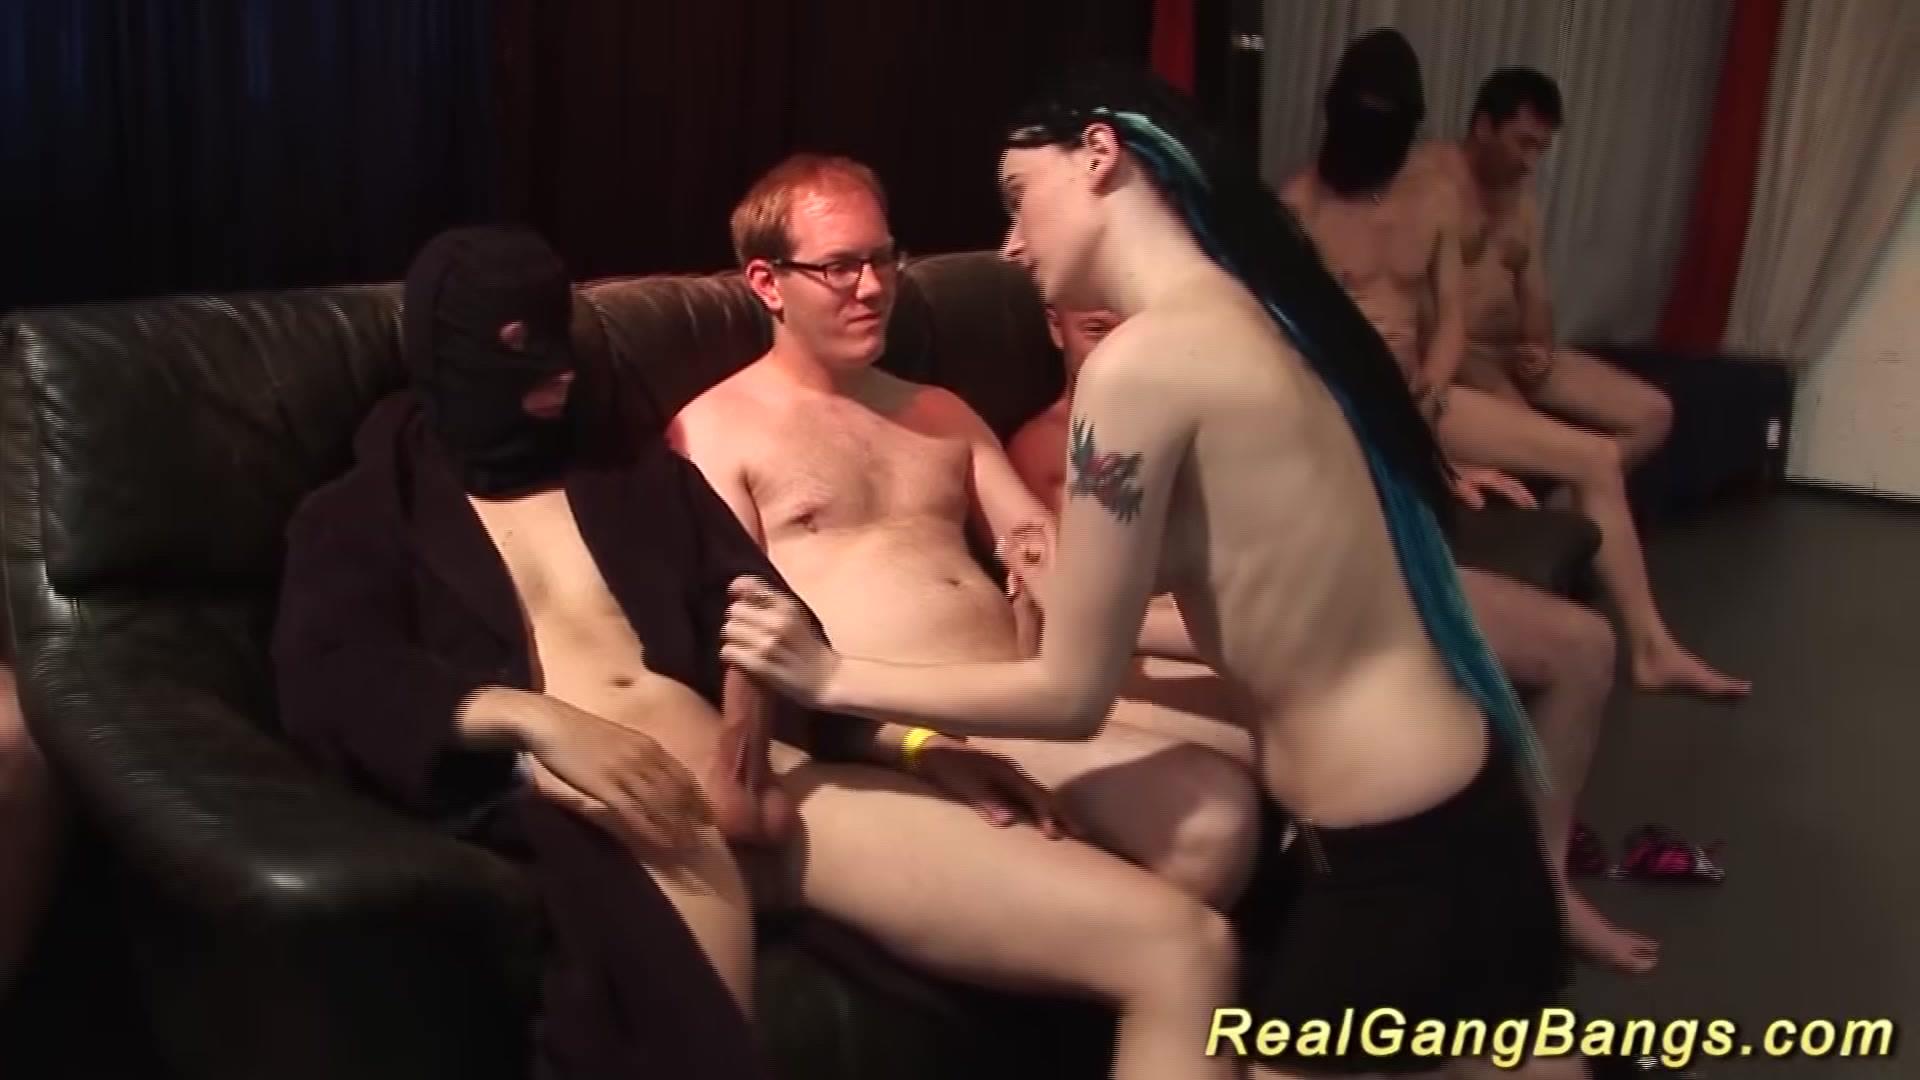 Anilos mature woman Good Video 18+